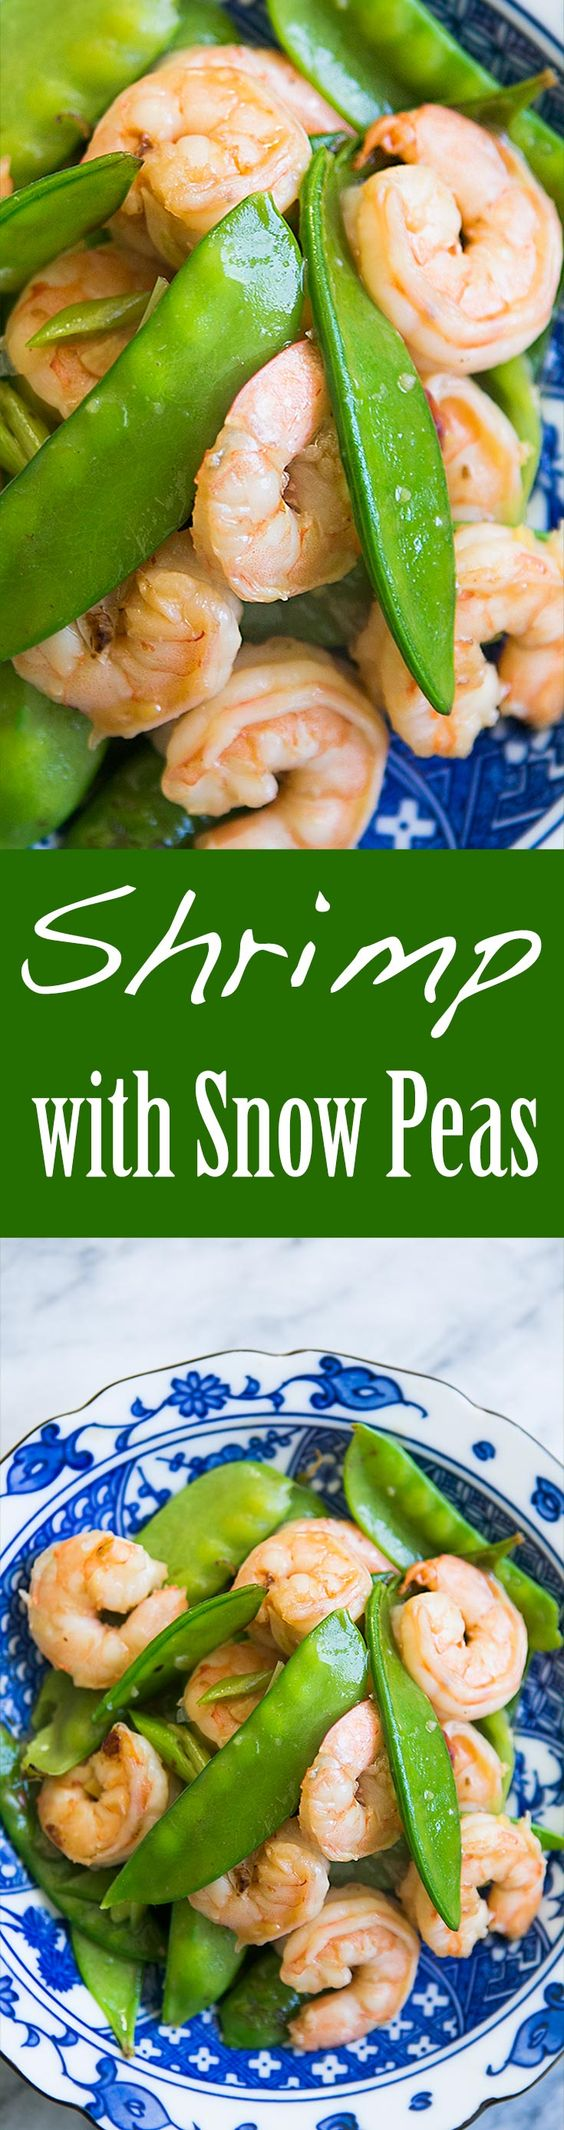 Shrimp, Snow peas and Salts on Pinterest